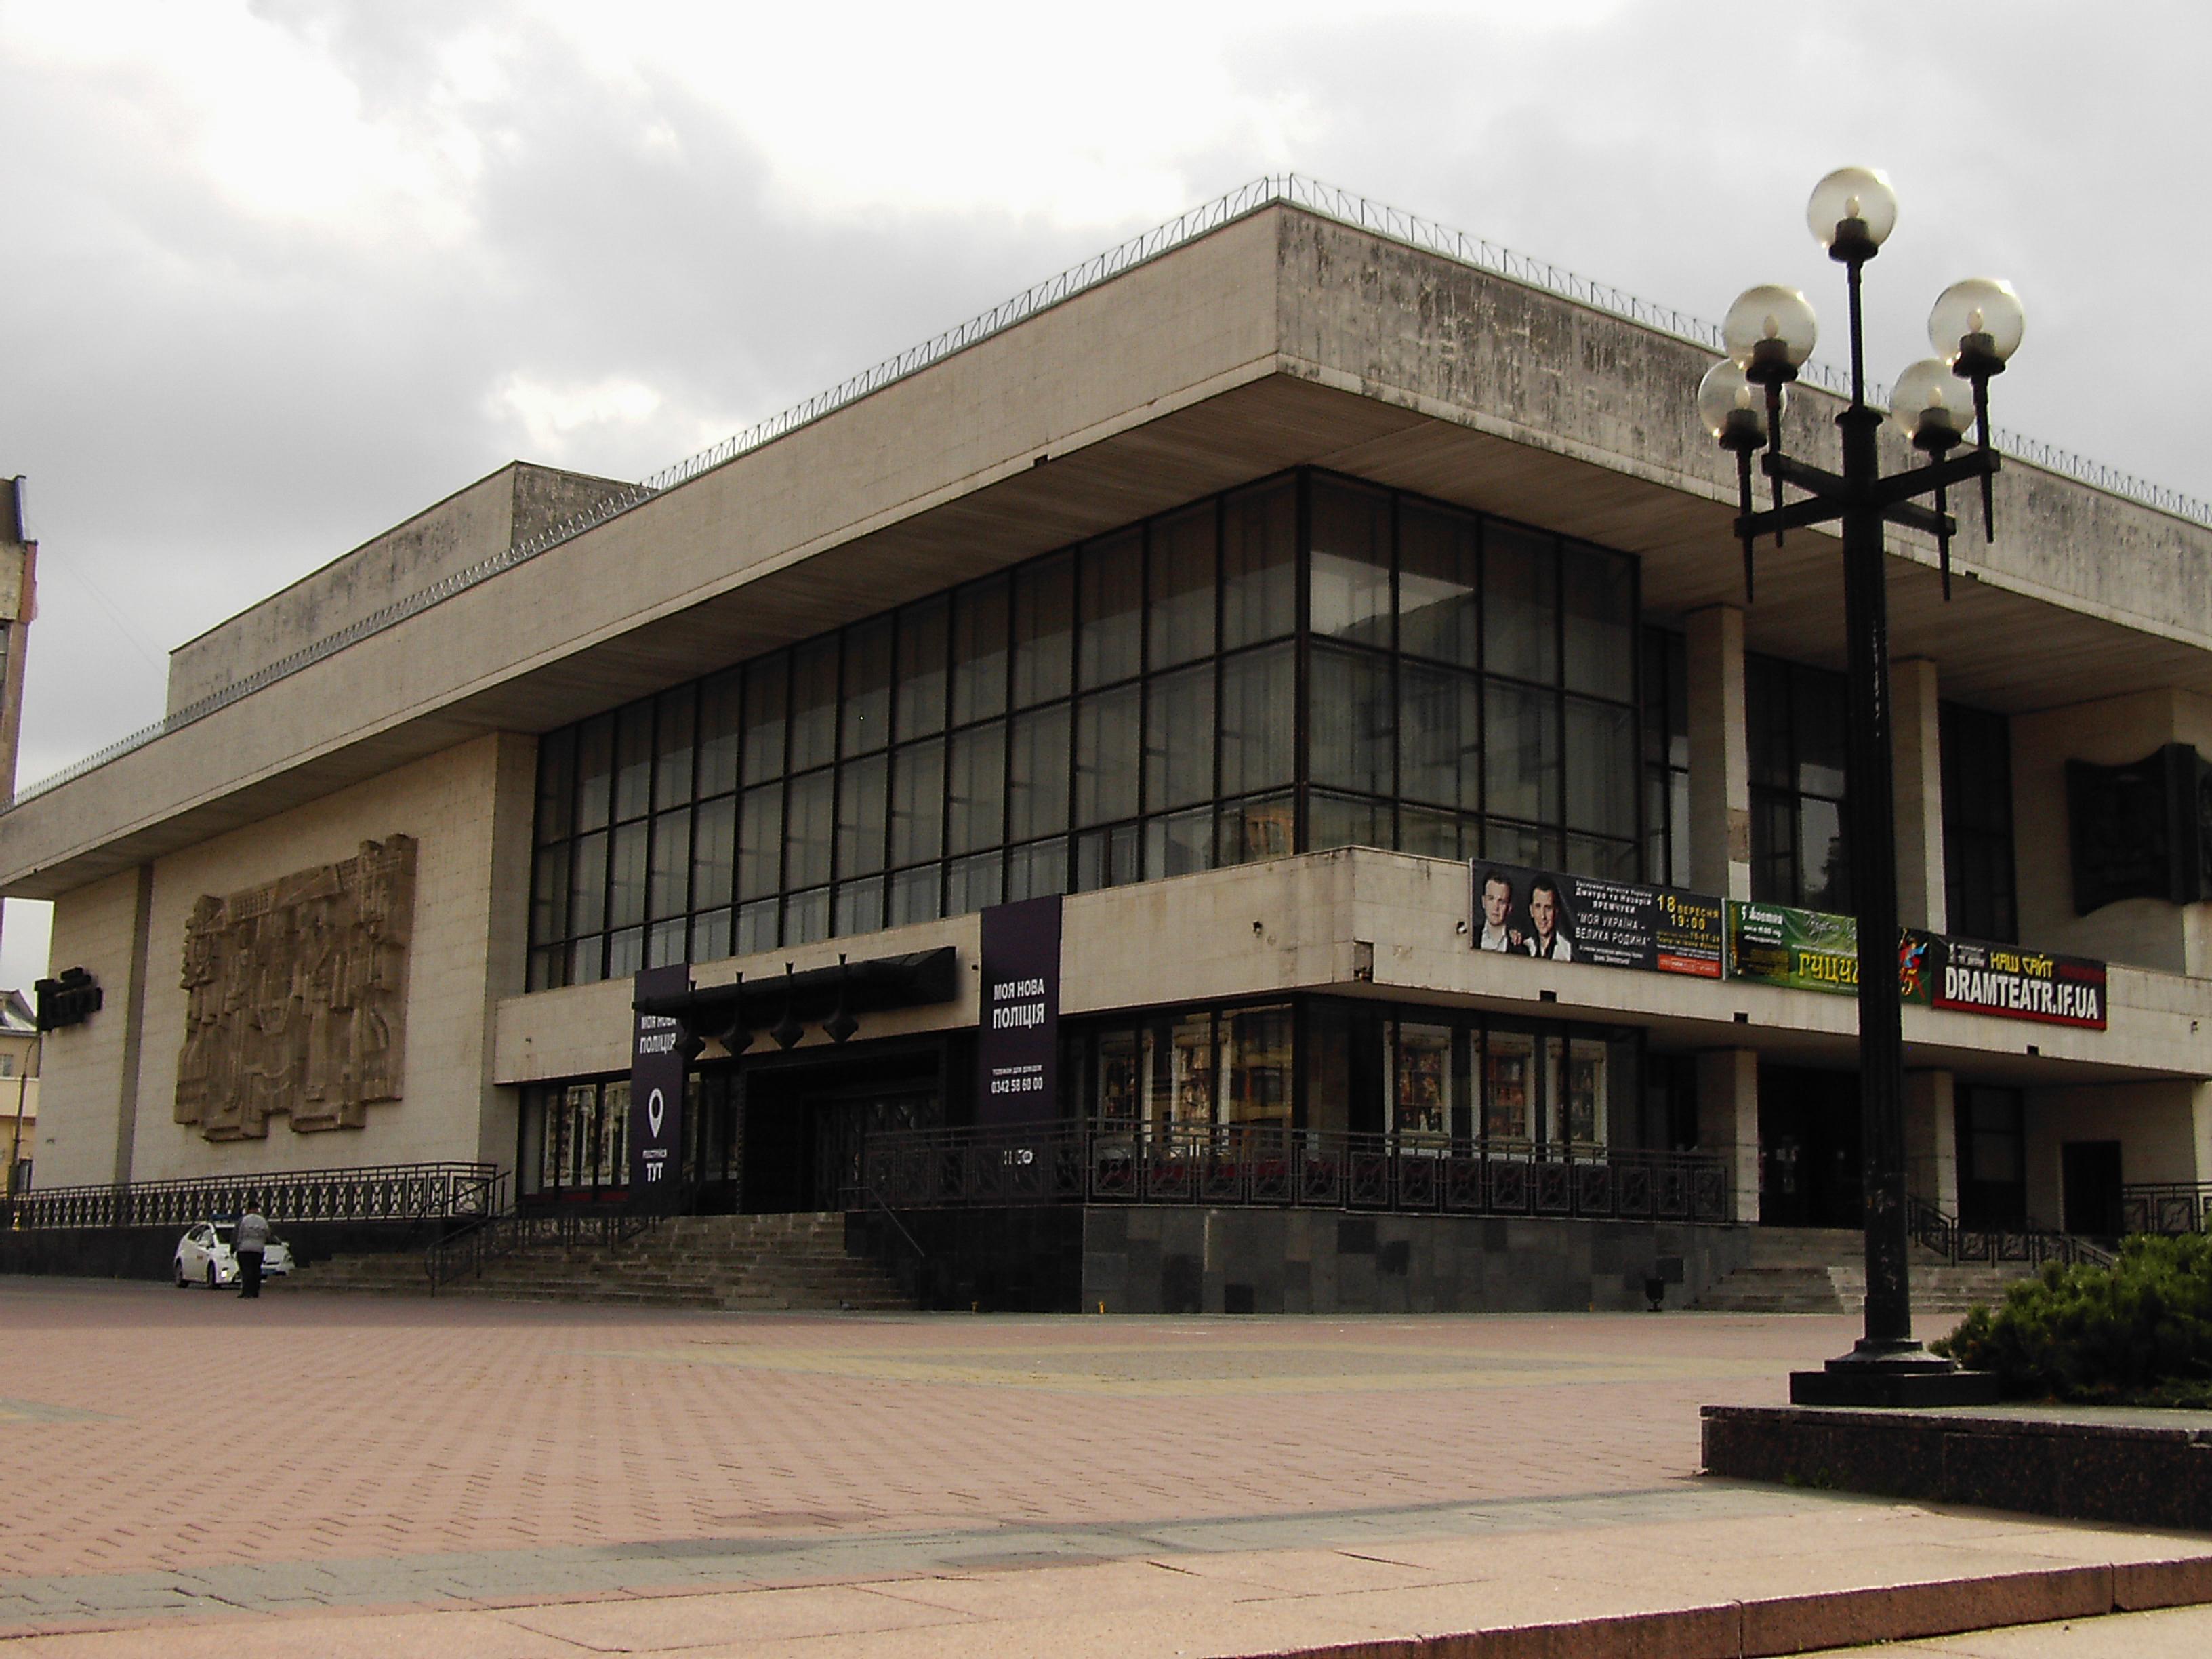 Драмтеатр оприлюднив афішу на перший місяць нового театрального сезону